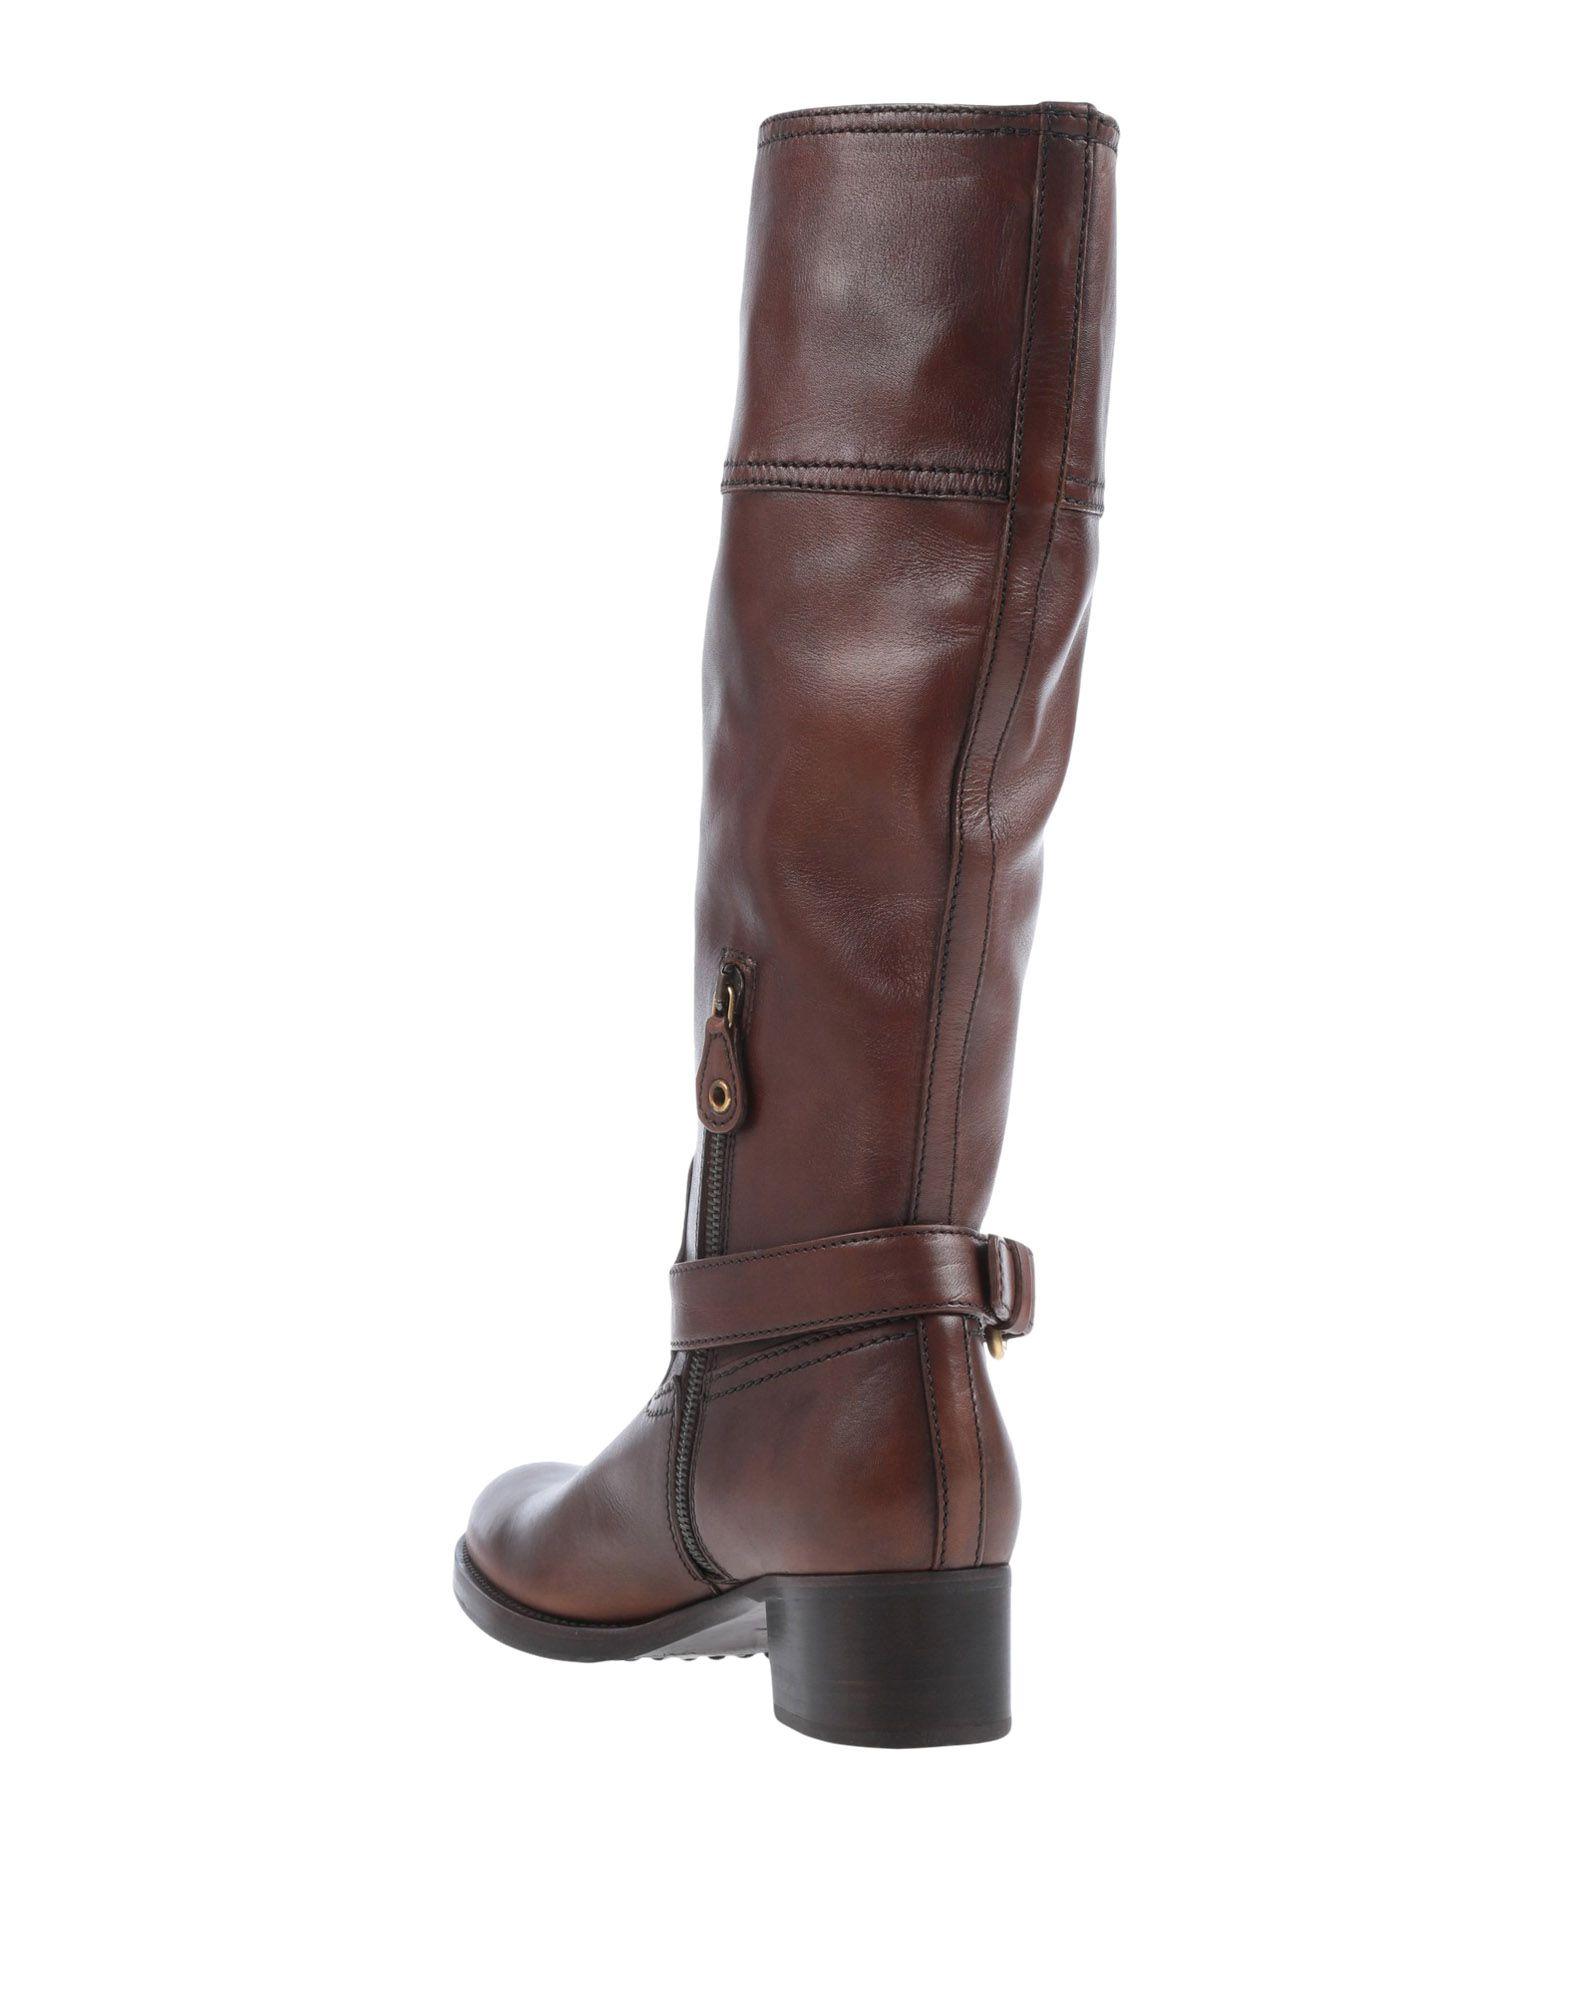 Rabatt Schuhe Carshoe Stiefel  Damen  Stiefel 11536582MP 9d797d